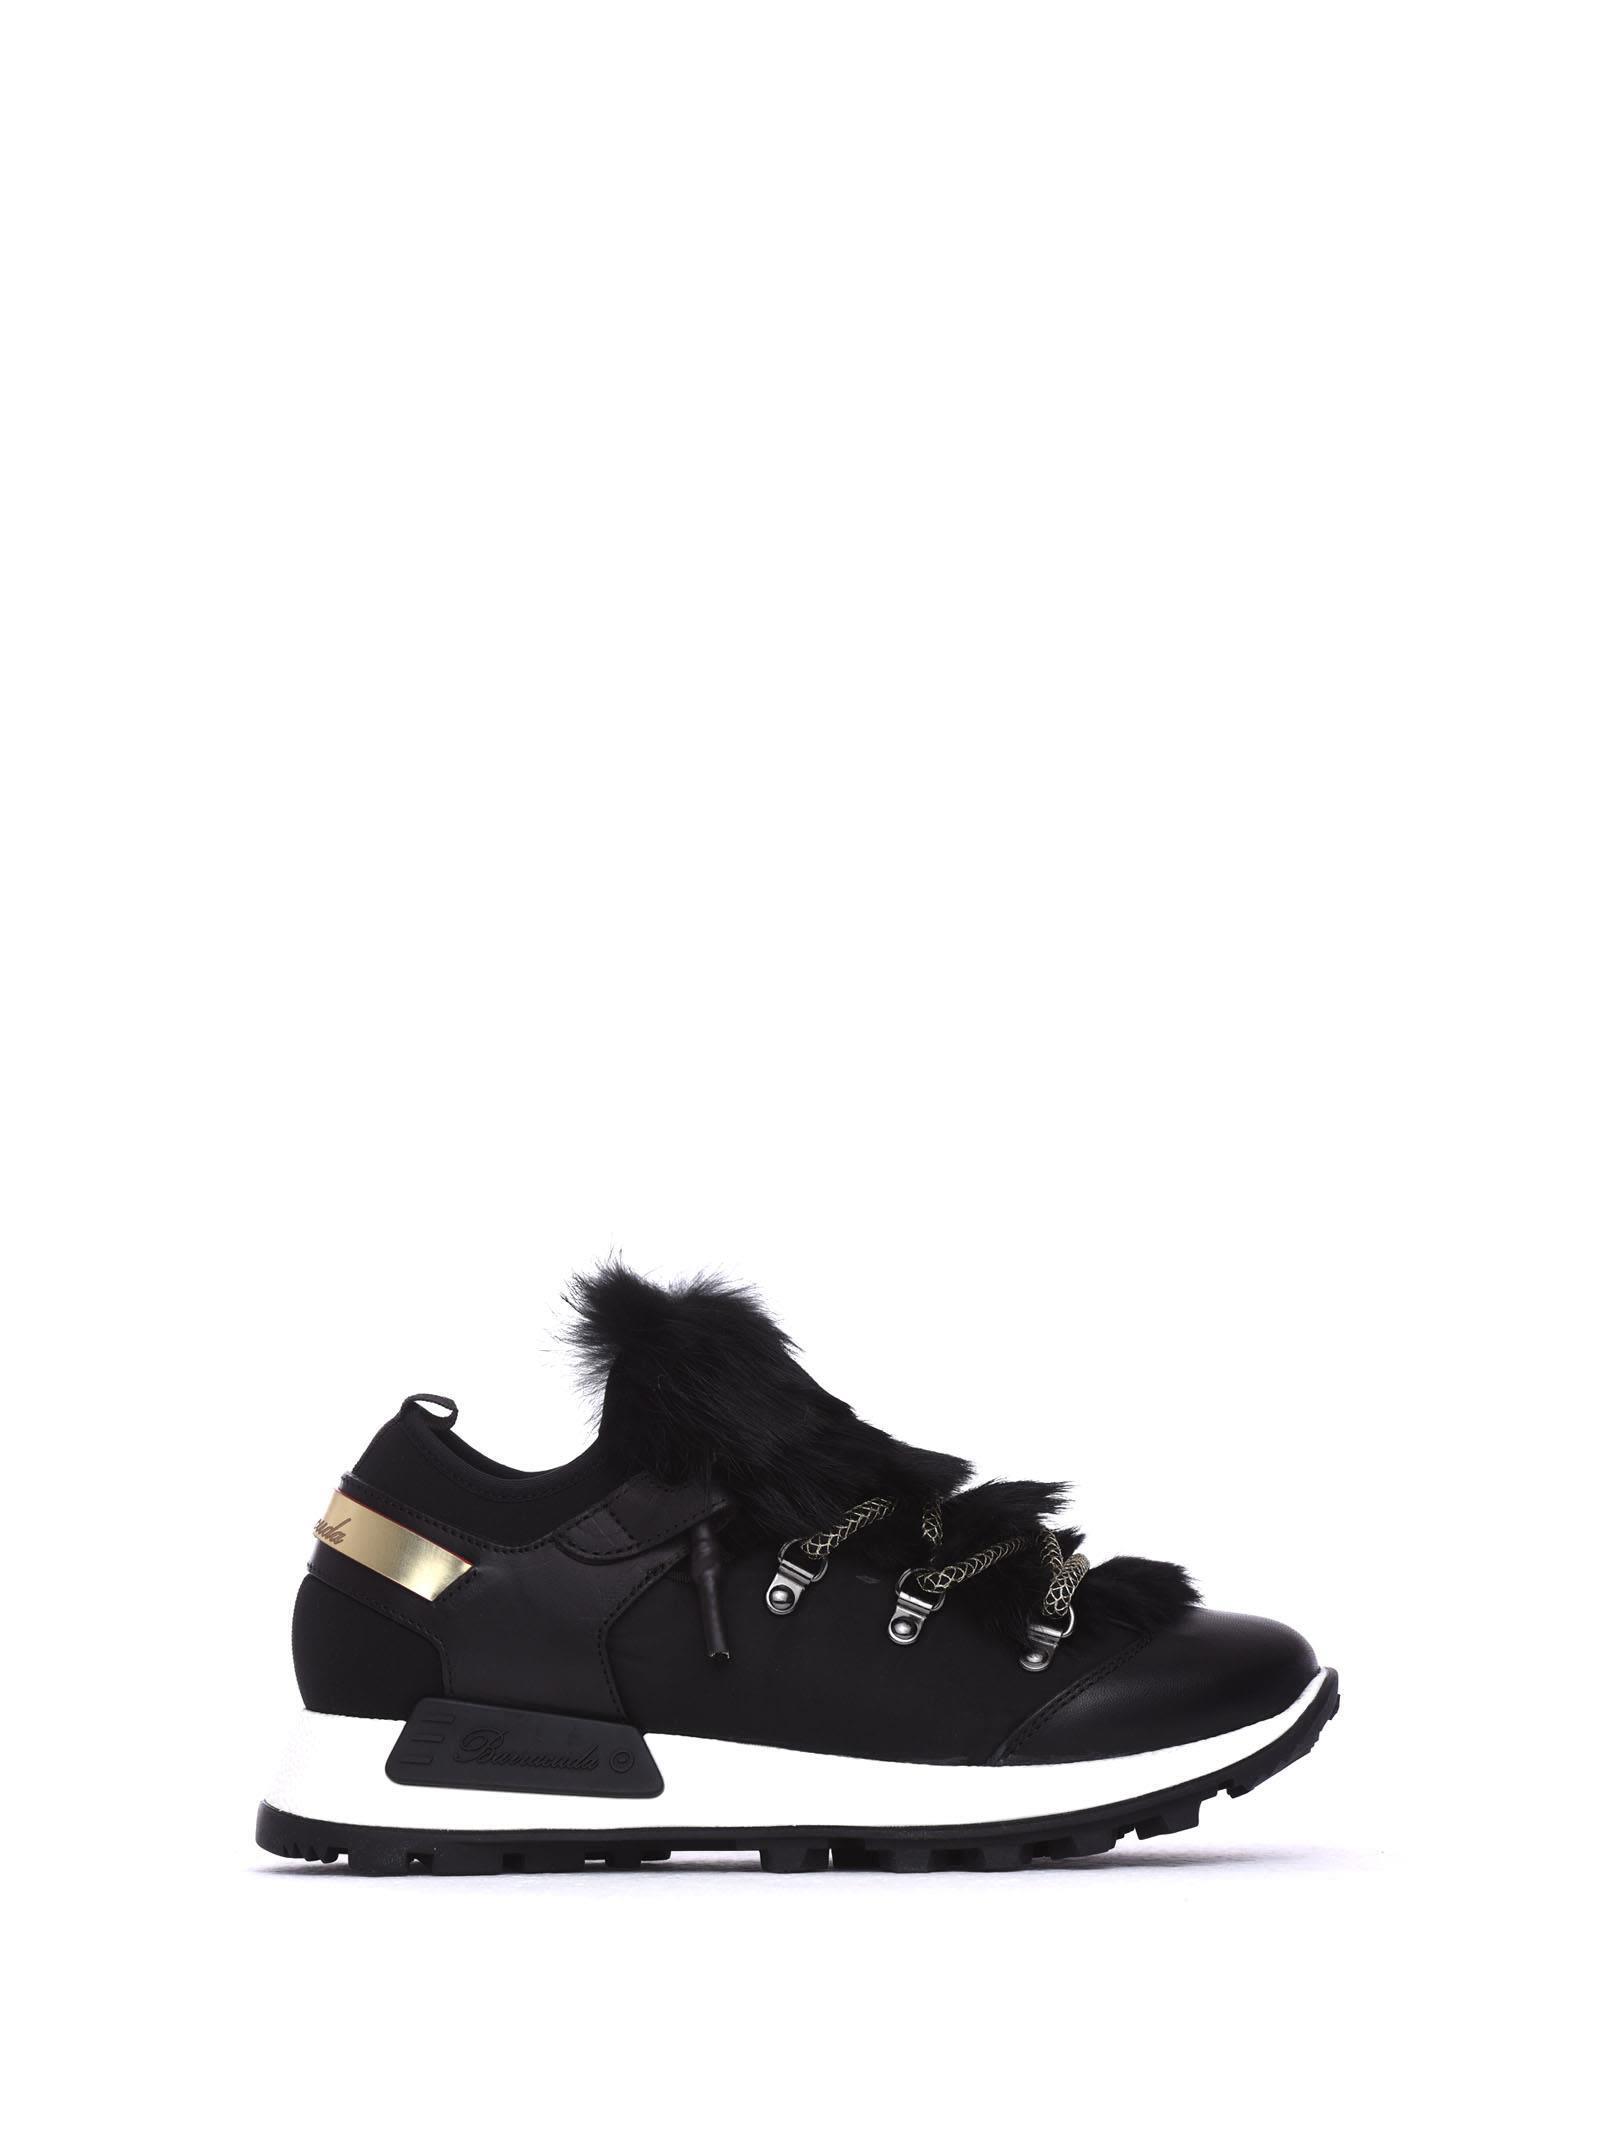 Barracuda Denali Black Sneakers In Nero